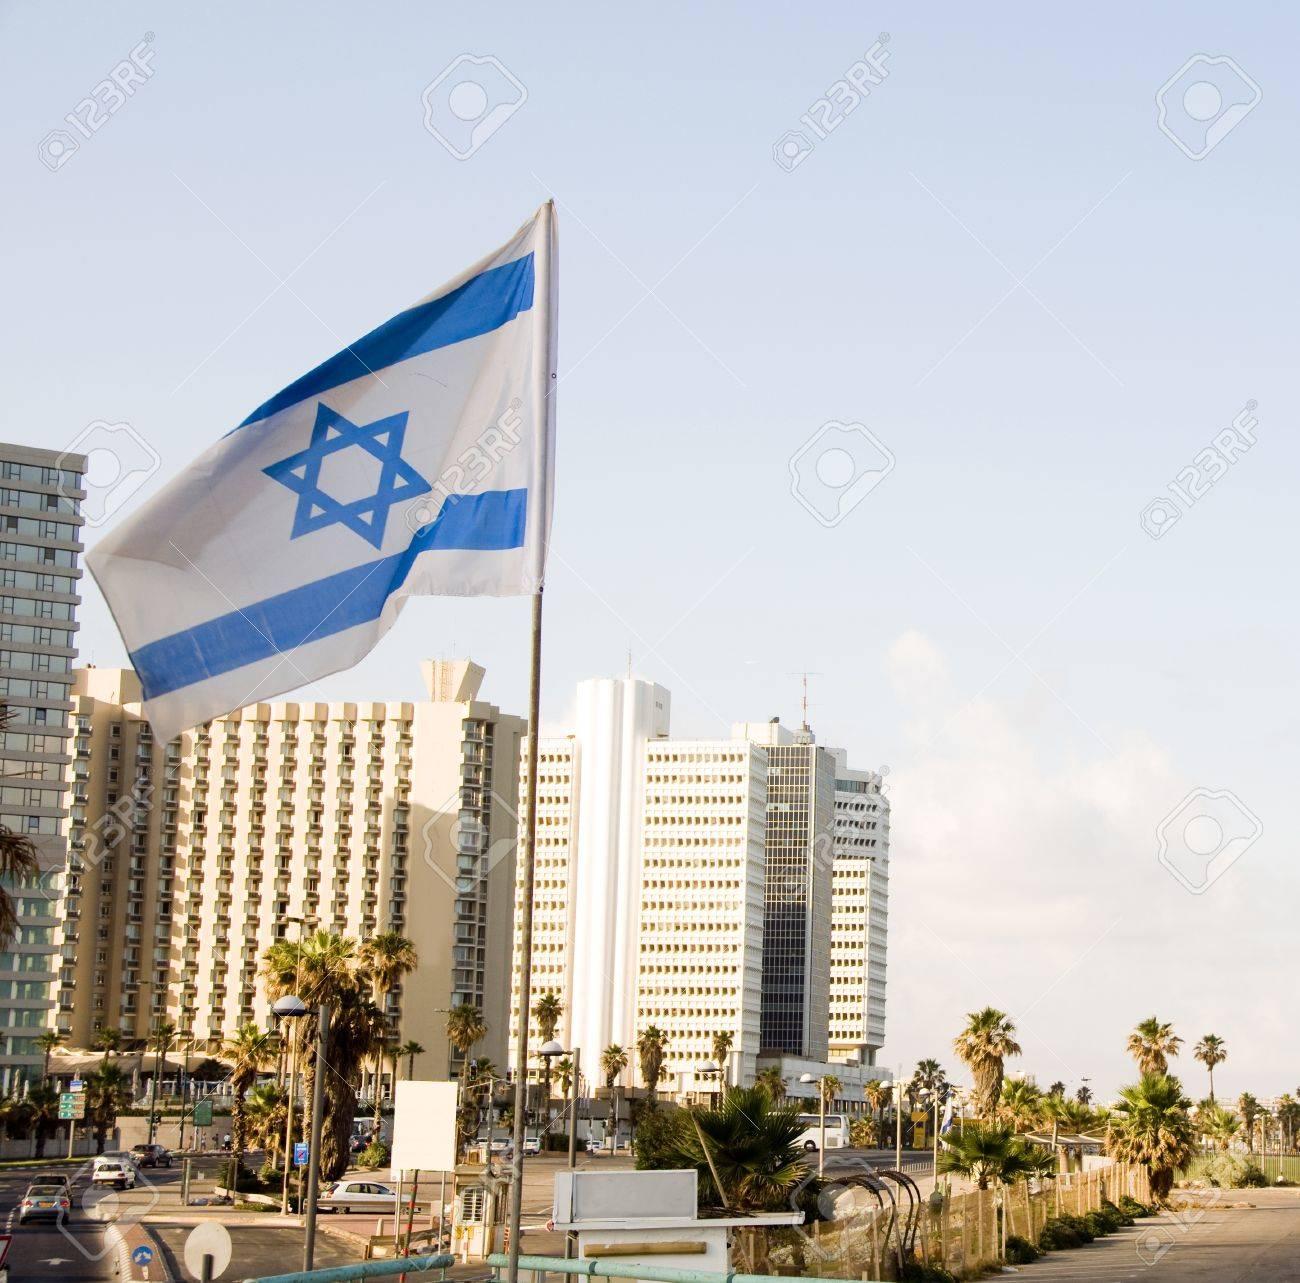 skyline cityscape with national Israeli flag and high rise hotel buildingsTel Aviv Israel Stock Photo - 14125570